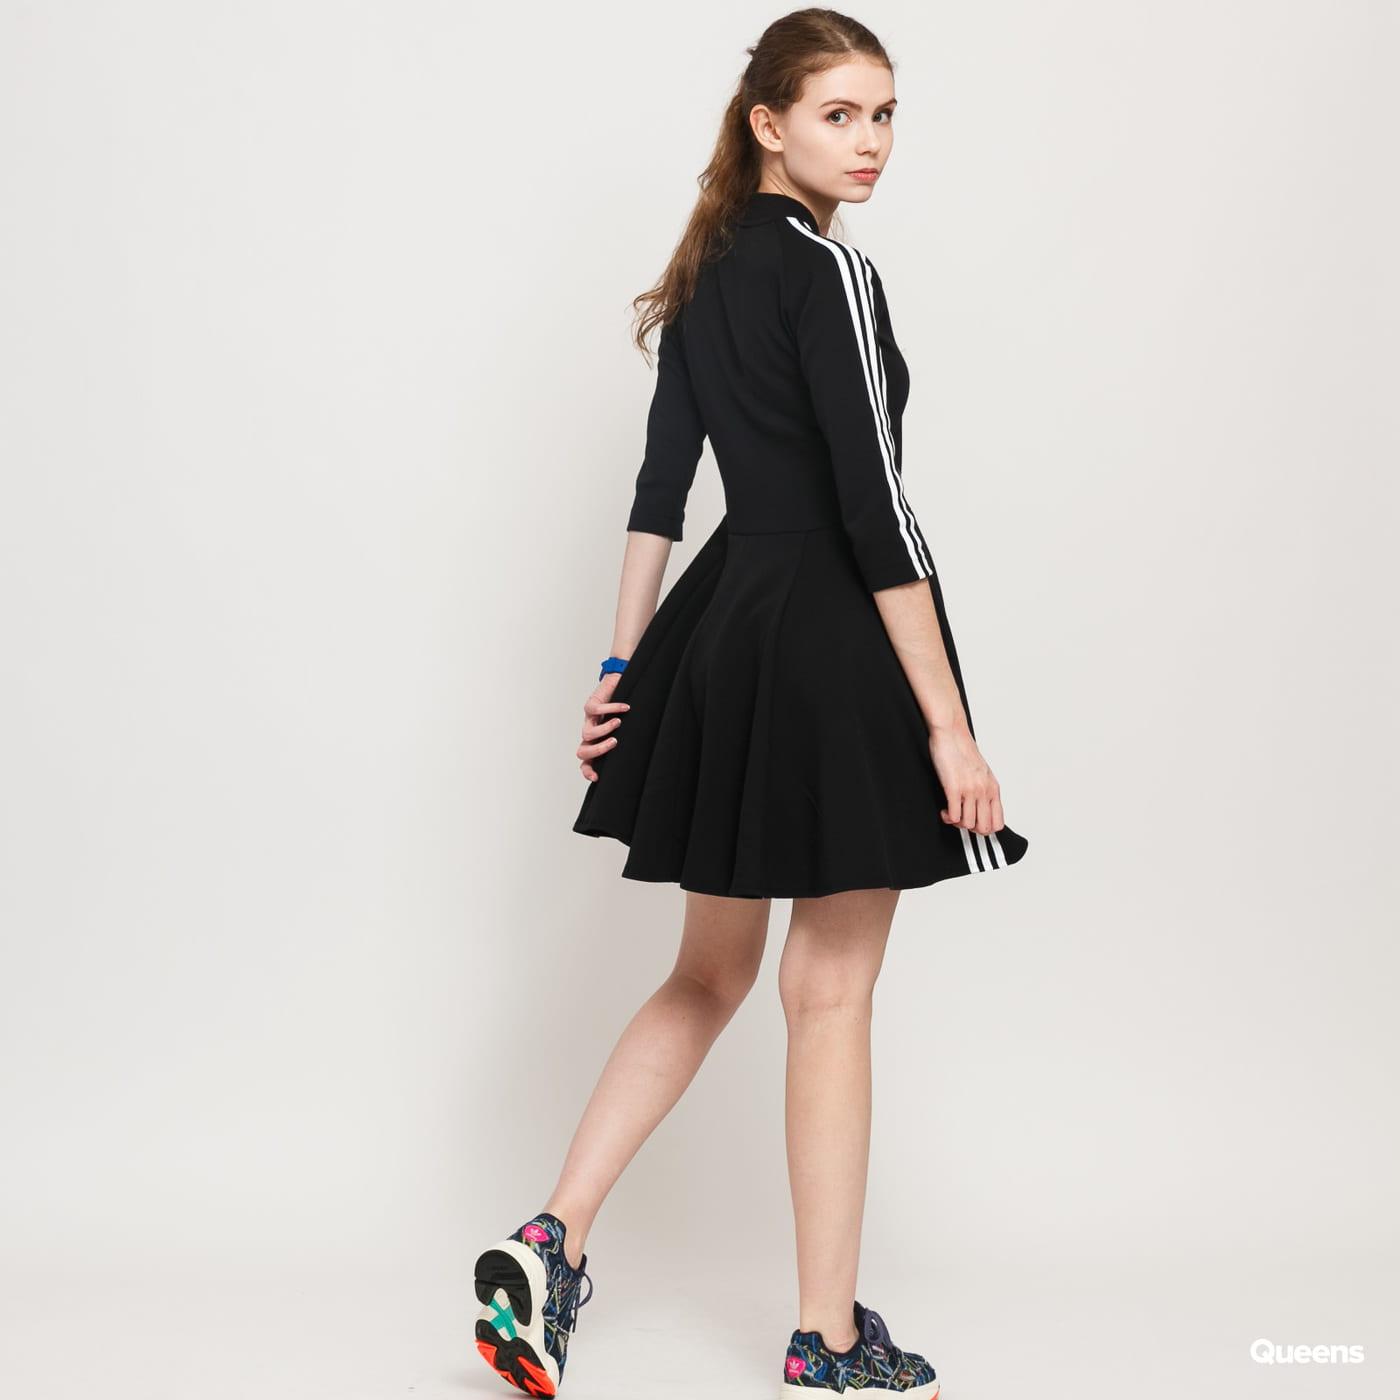 Grillo Mariscos entre  Dress adidas Performance W 3 Stripes Dress black (FL6901) – Queens 💚